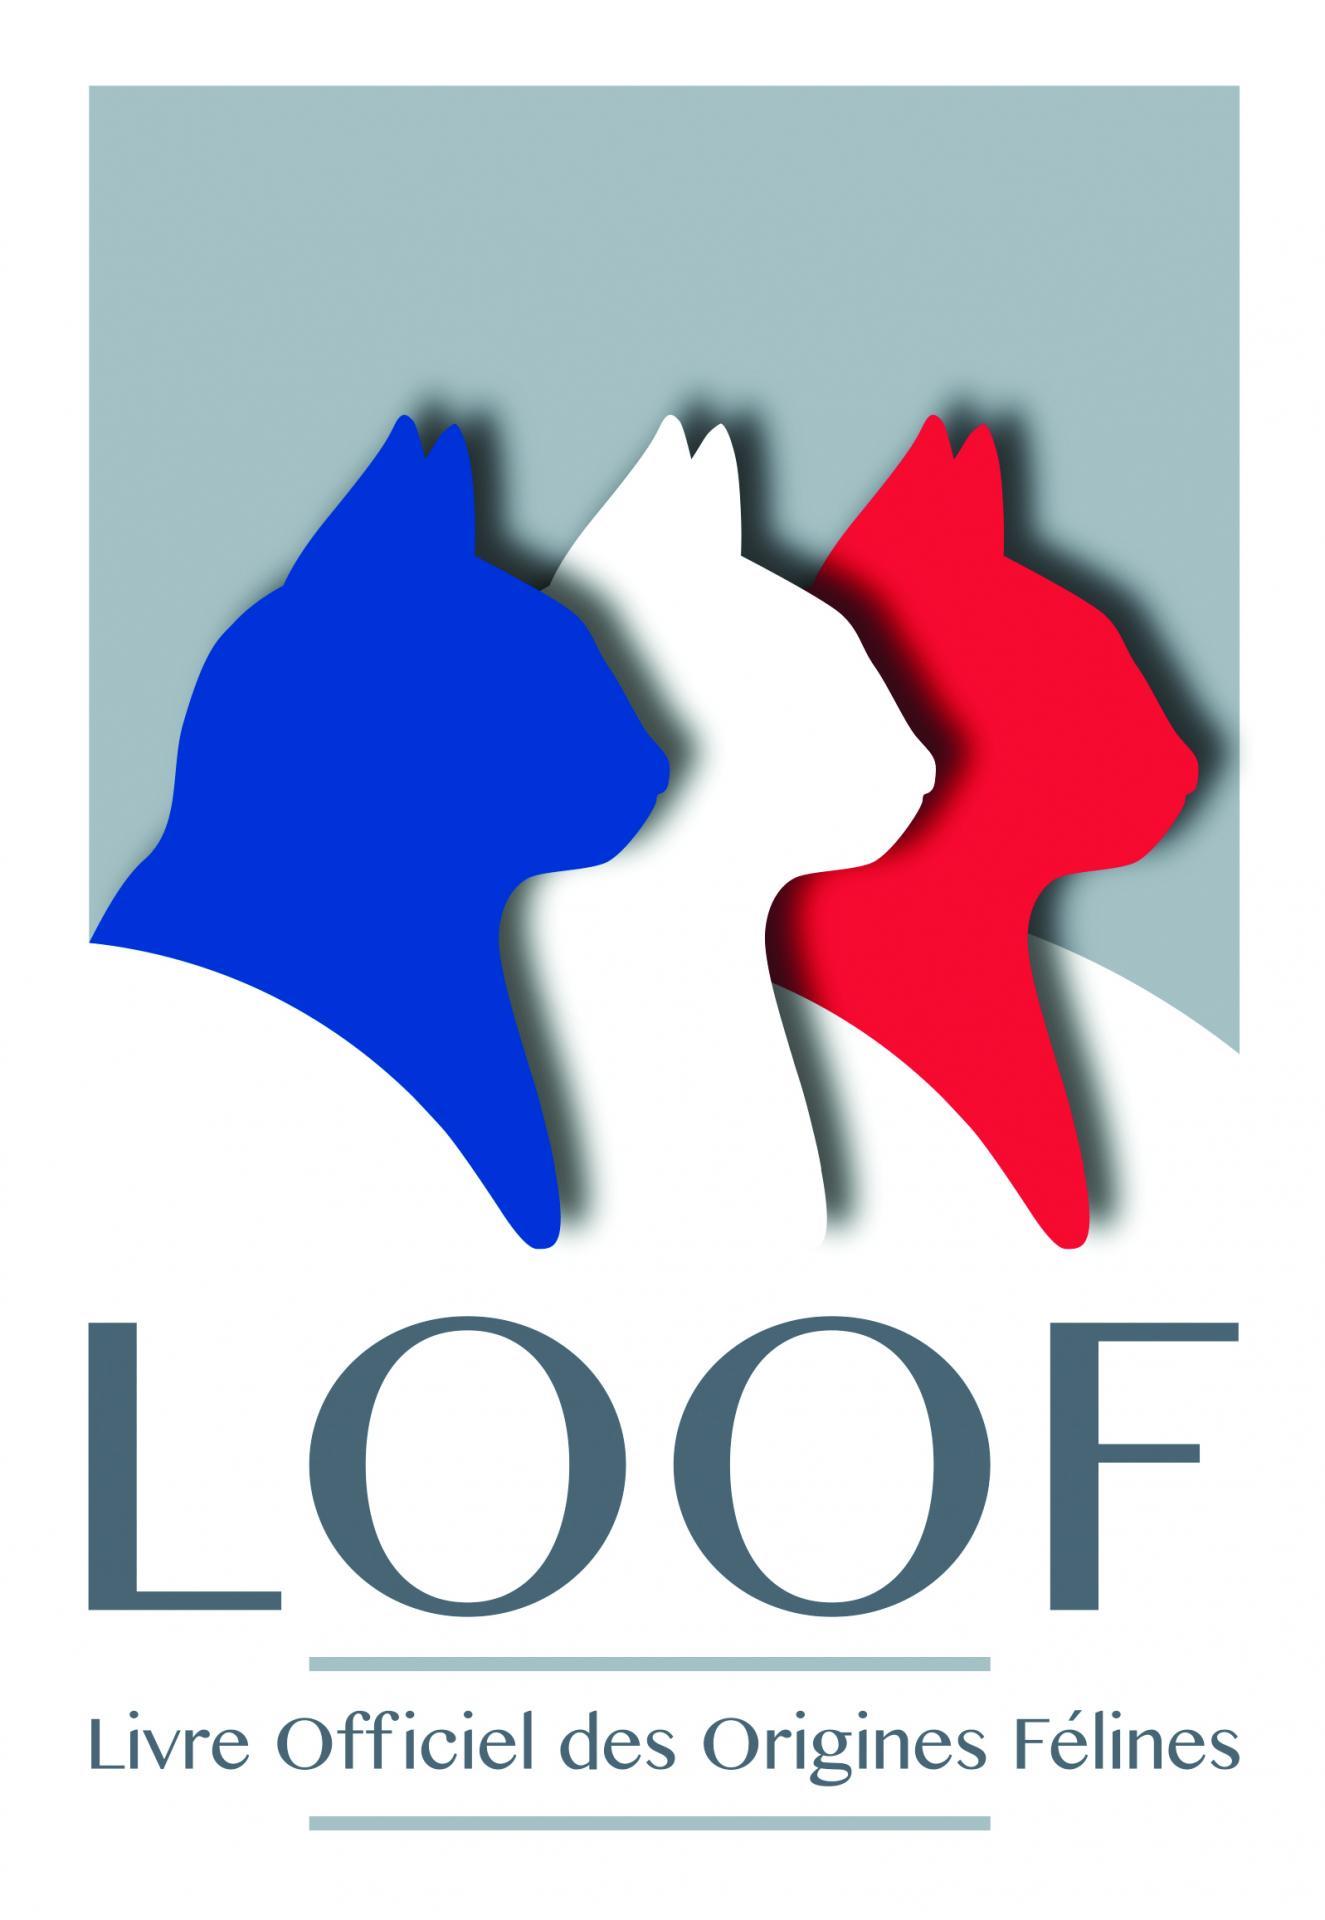 Loof logo zone utile 1